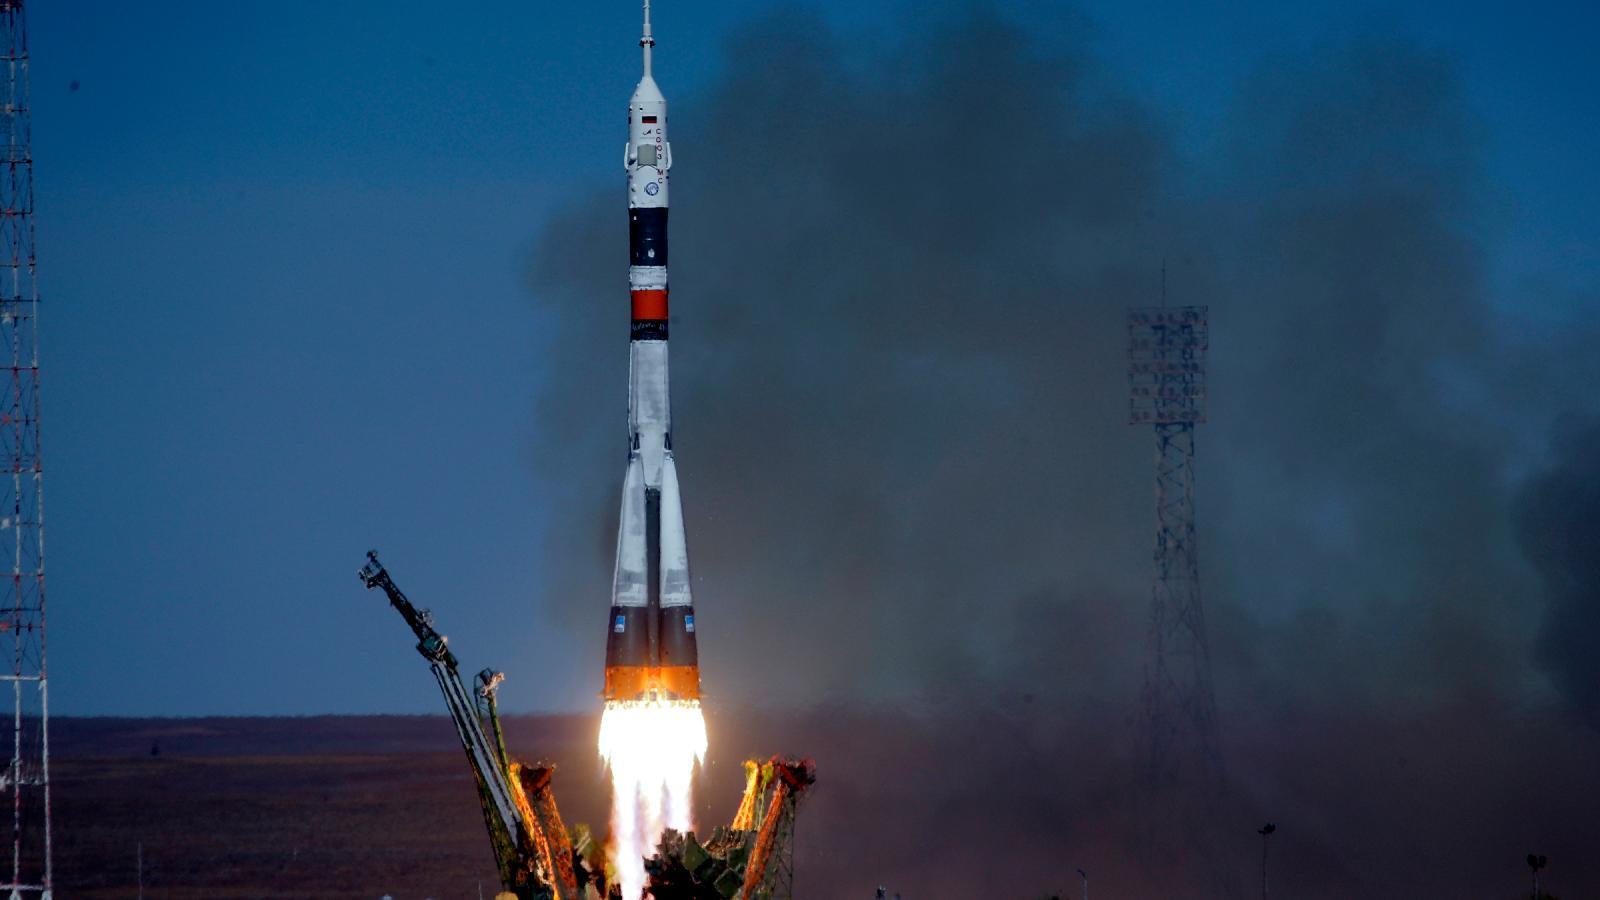 روسيا تطلق صاروخ سويوز مع 38 قمرا اصطناعيا على متنه